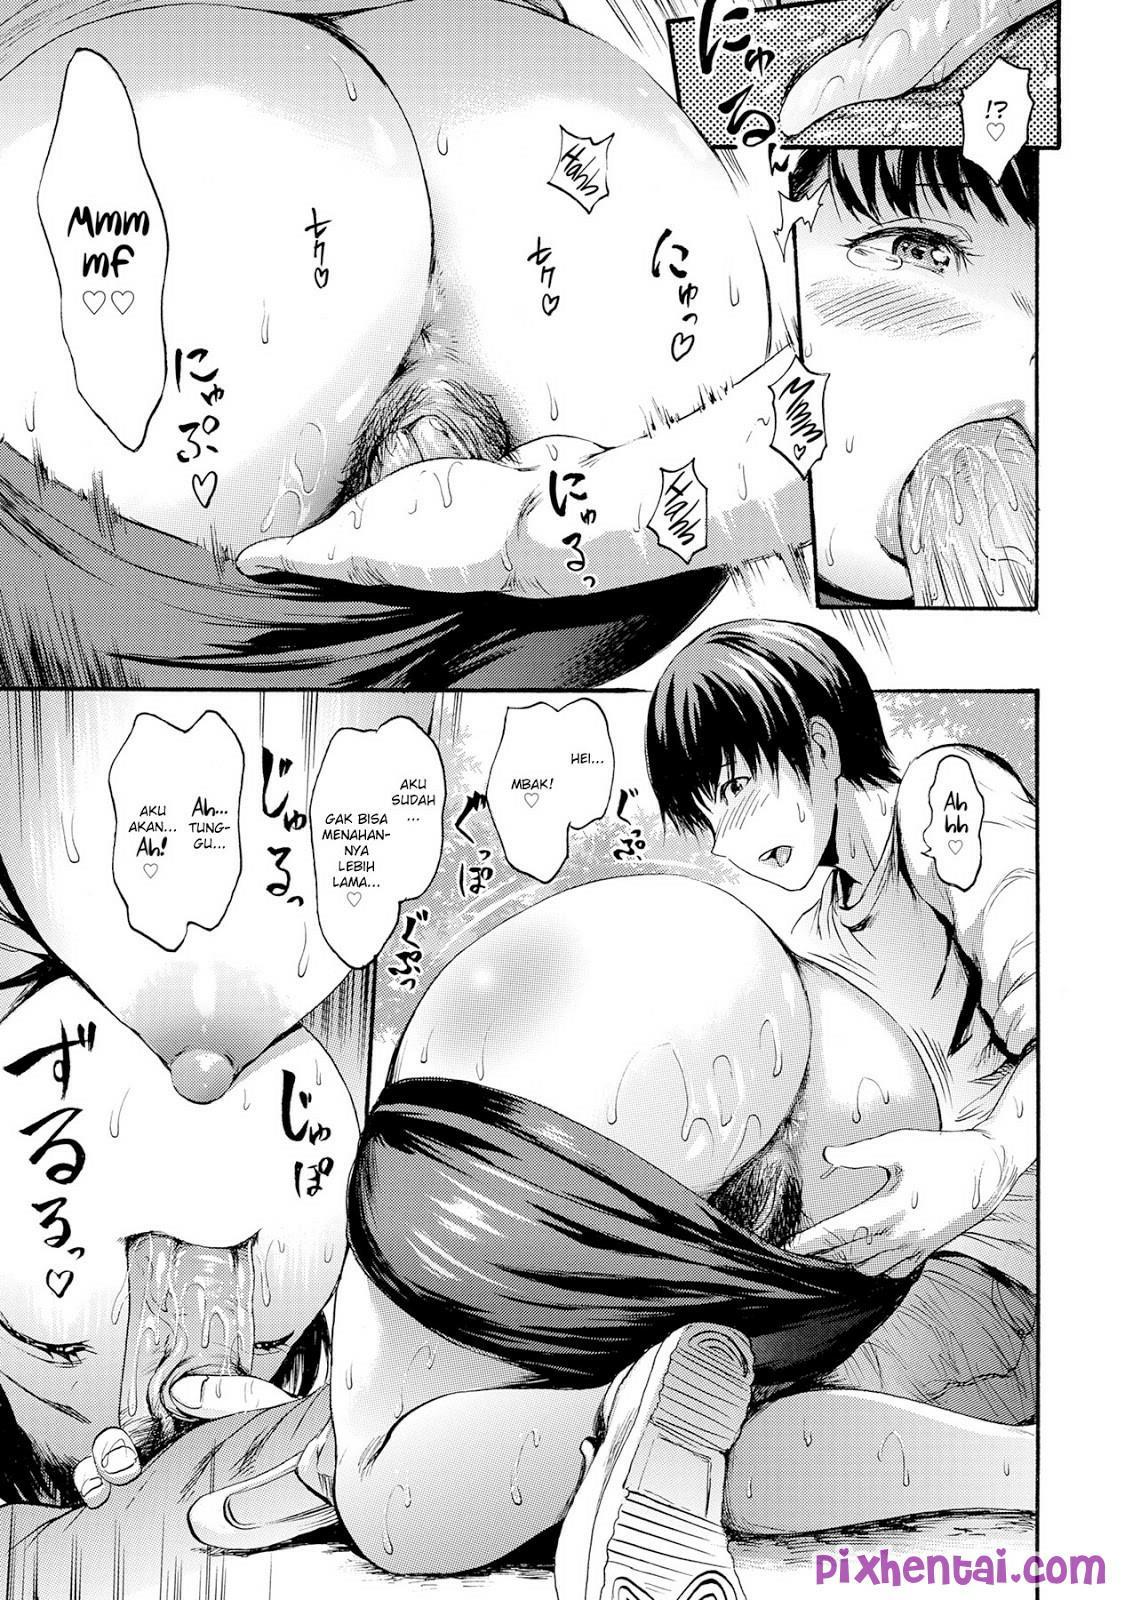 Komik hentai xxx manga sex bokep selingkuhi mbak ipar semok di kebun 13